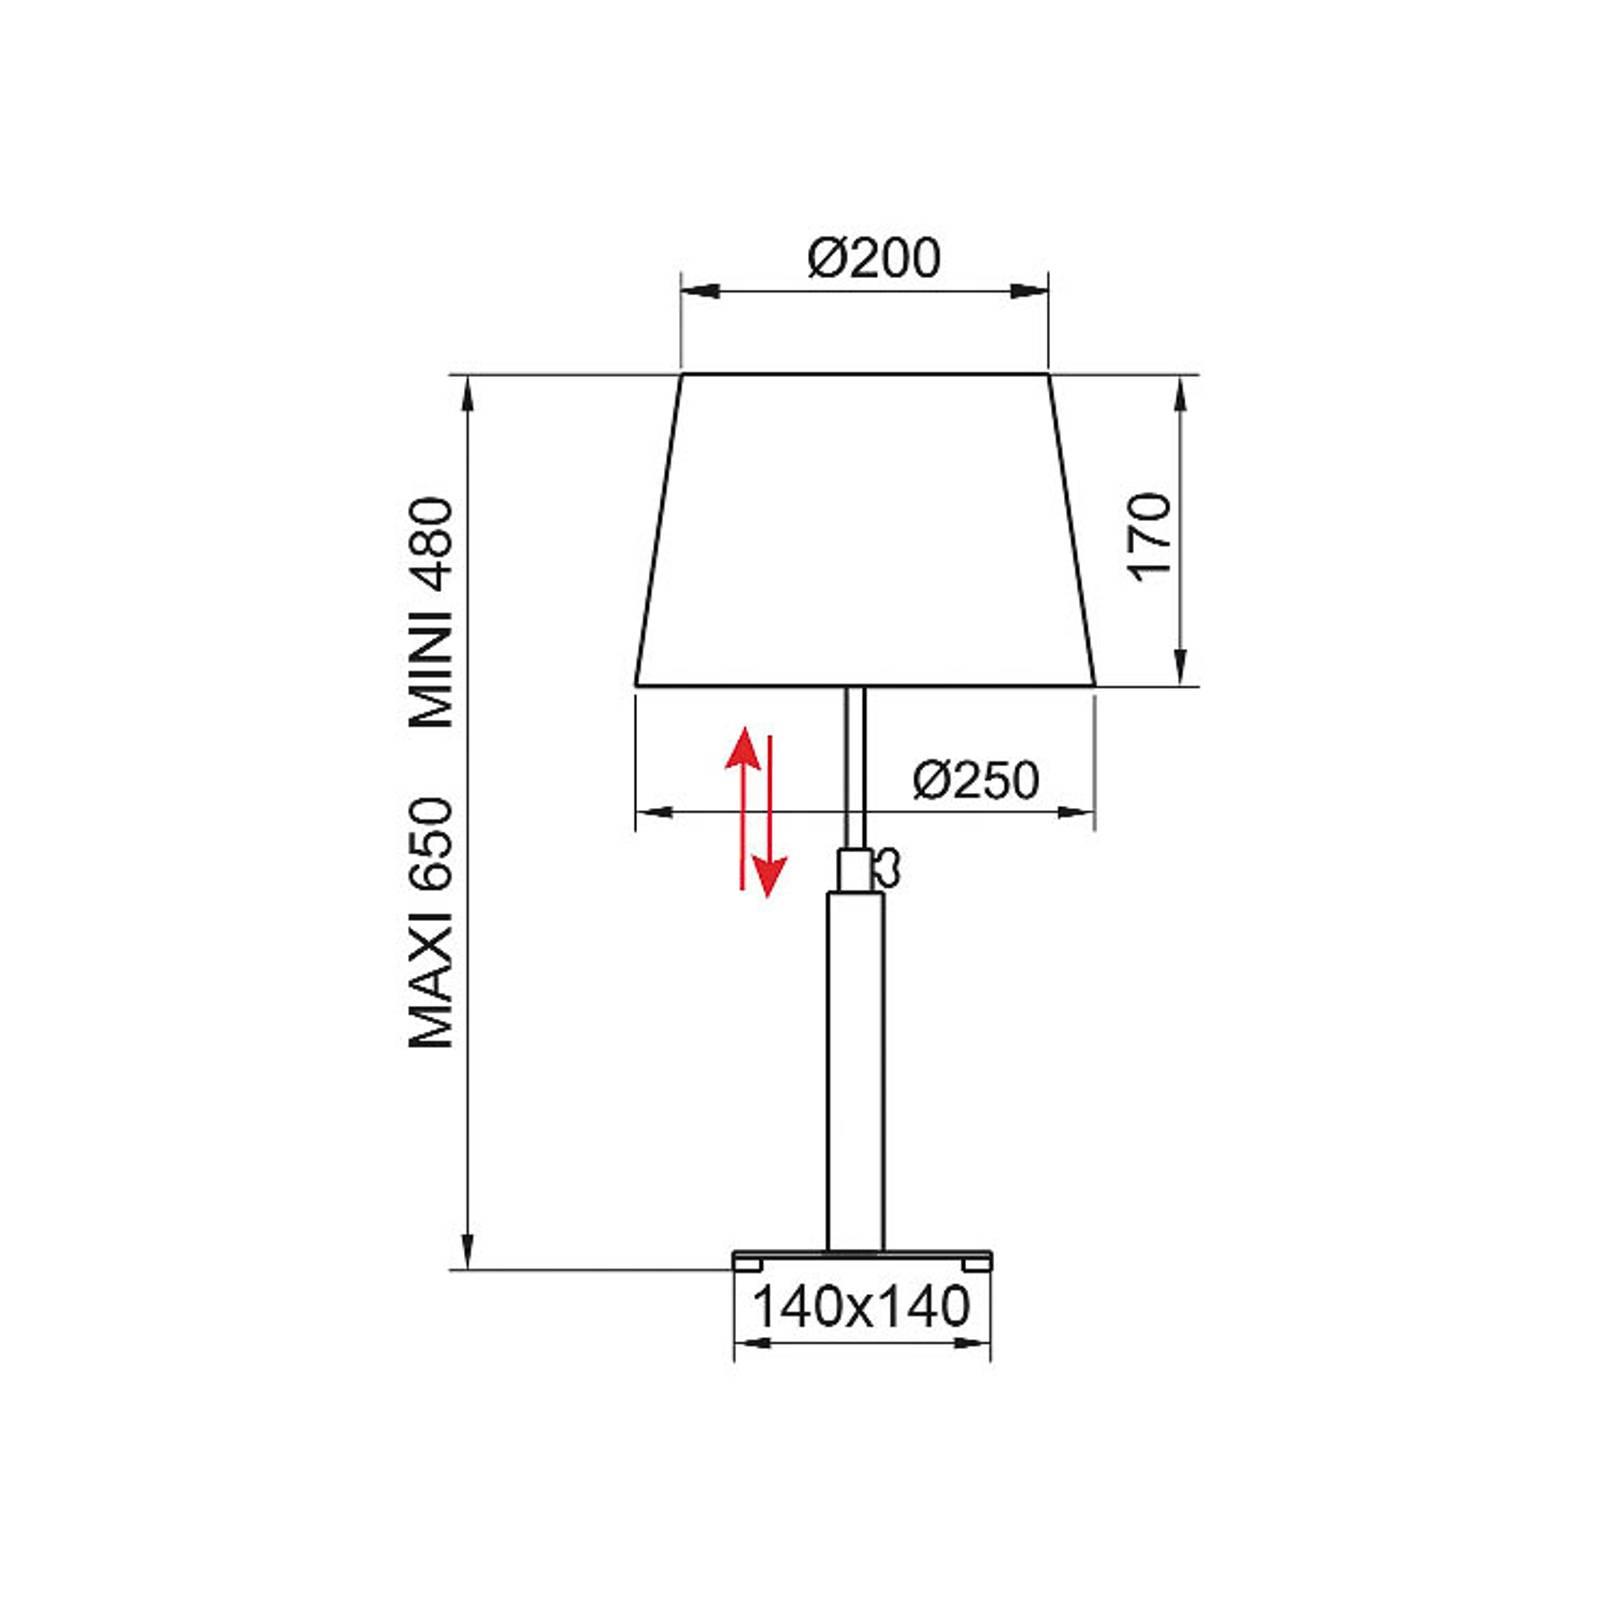 Aluminor Quatro Up-pöytälamppu, vaalea tammi/kromi